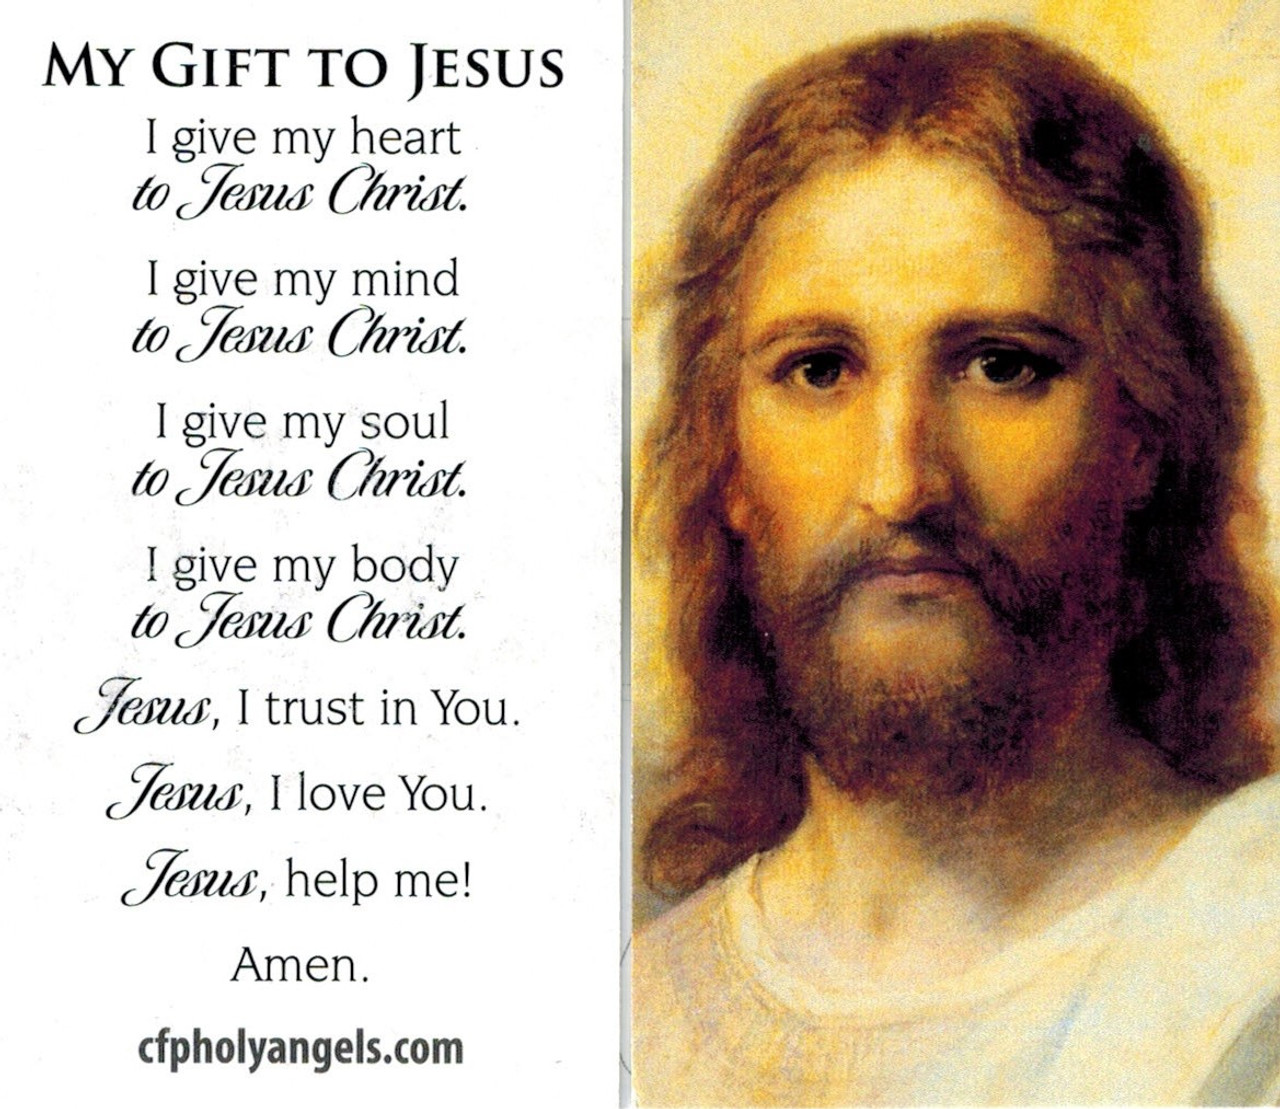 My Gift to Jesus Prayer Card